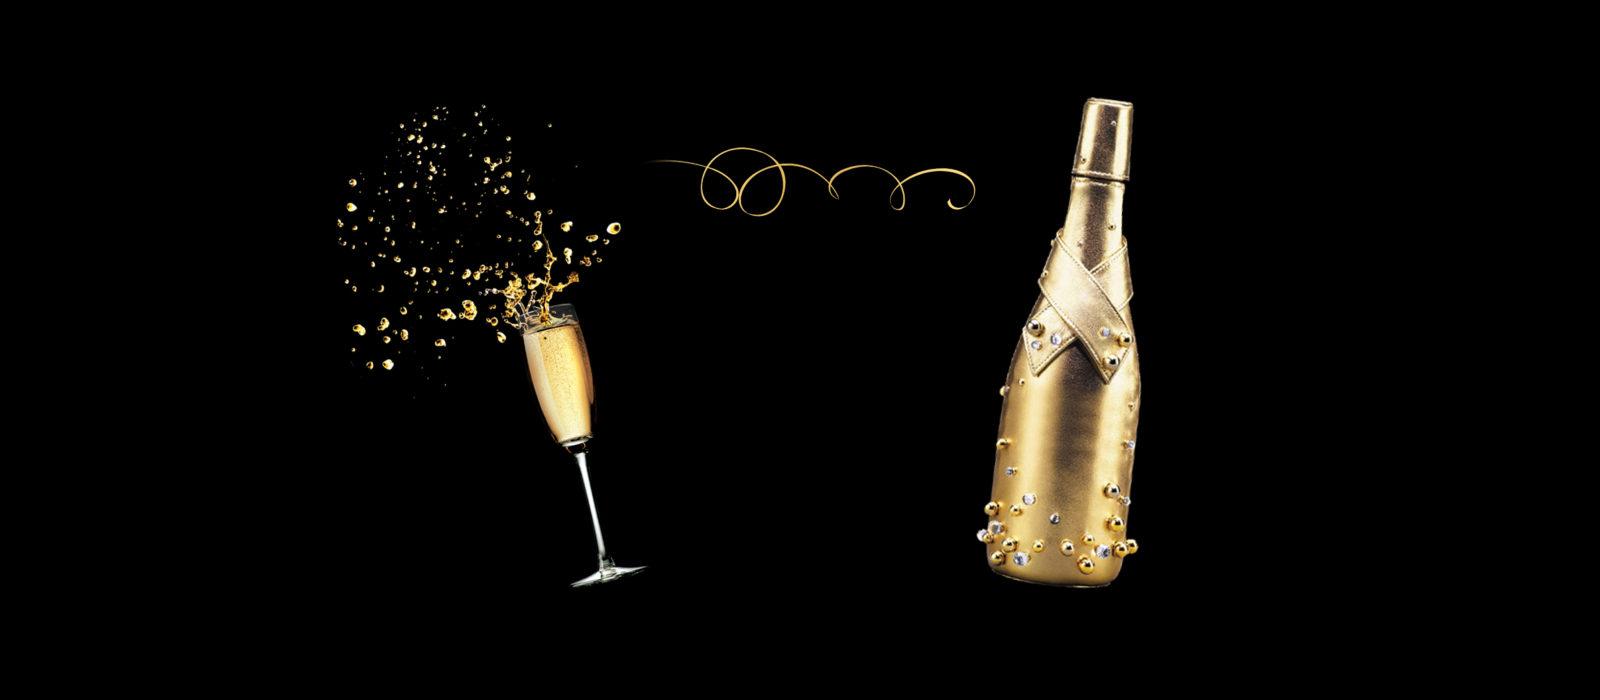 ROC2ROCMUSIC RADIO & BEHINDAGROOVE RADIO Presents The End Of Year Celebration 2017